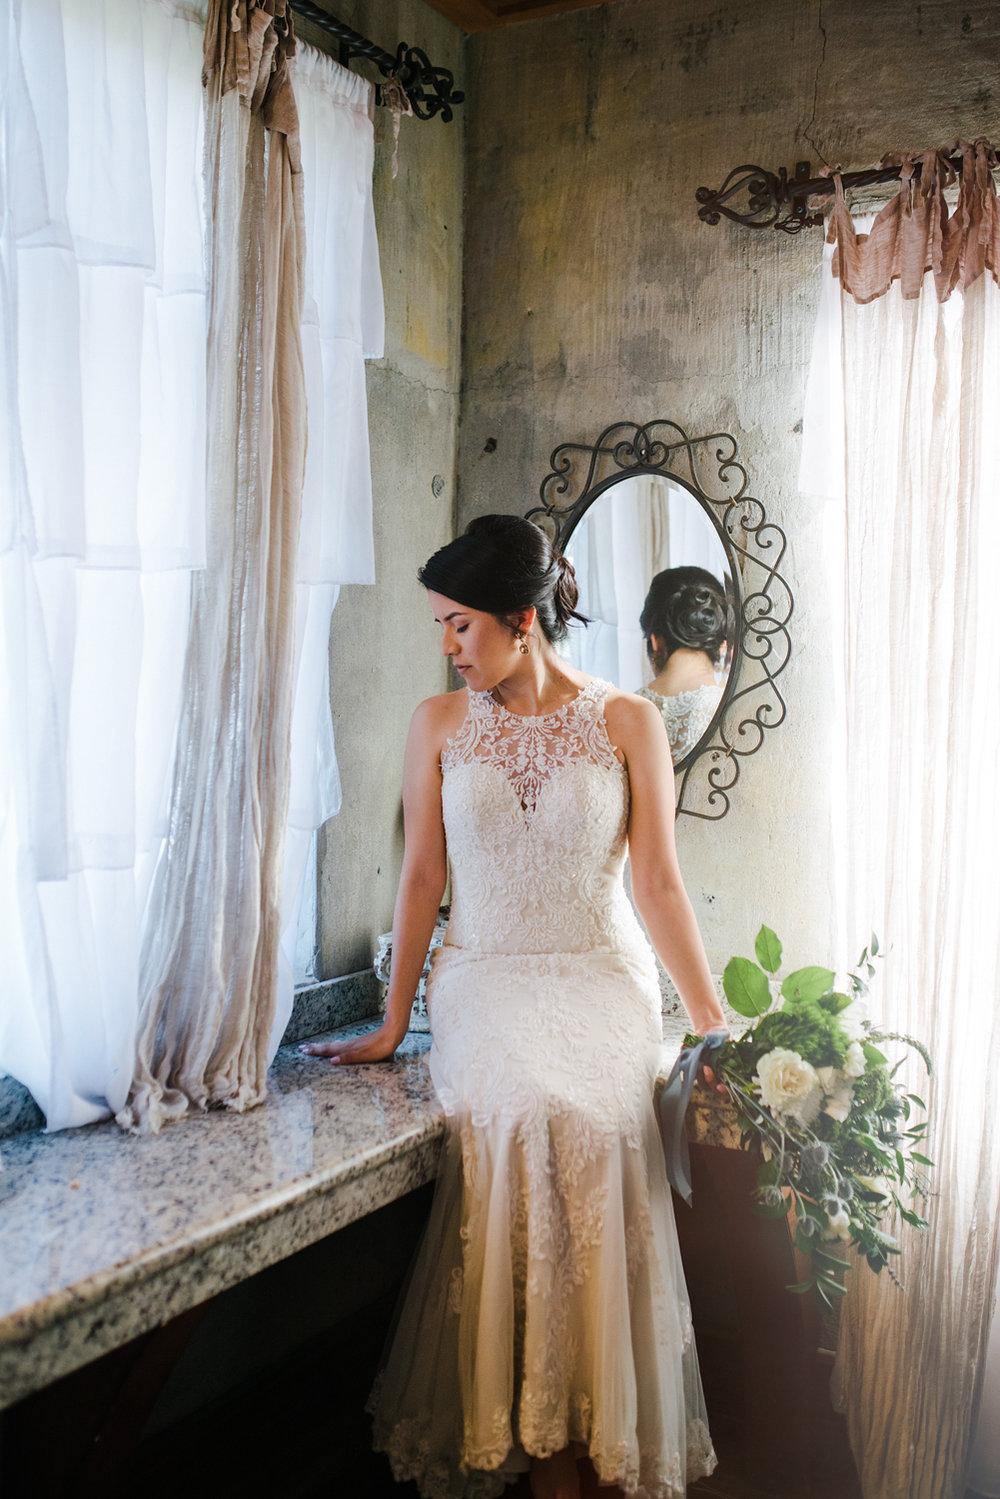 casperwedding-texasweddings-houstonweddings-oldedobbestation-montgomerytx-montgomeryweddings-bride-groom-bridalparty-weddingdress-25.jpg